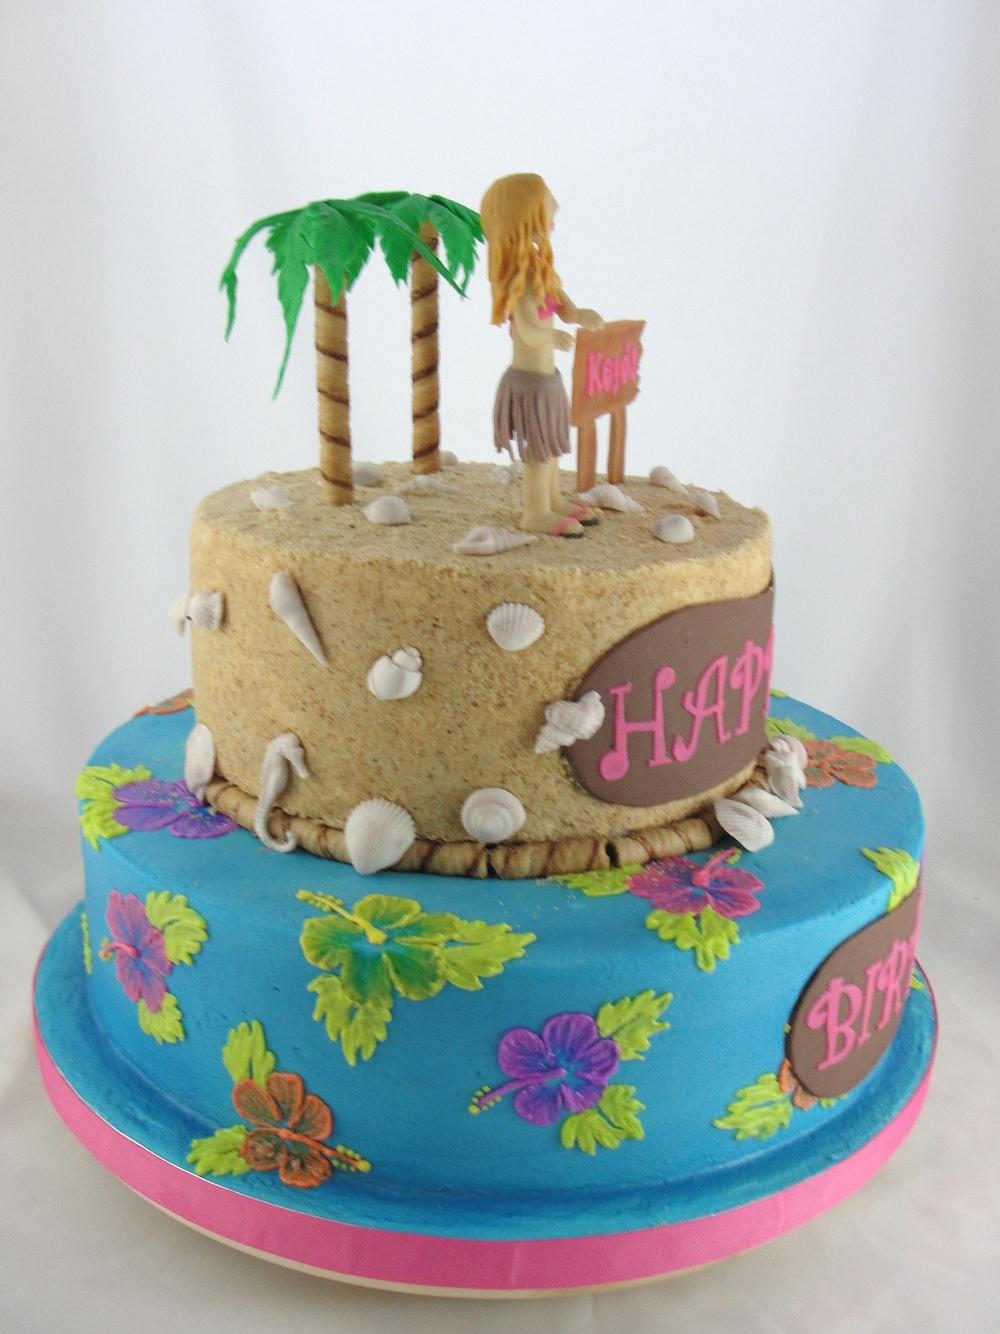 LBC 1321 - Hawaiian Luau Cake 4.jpg